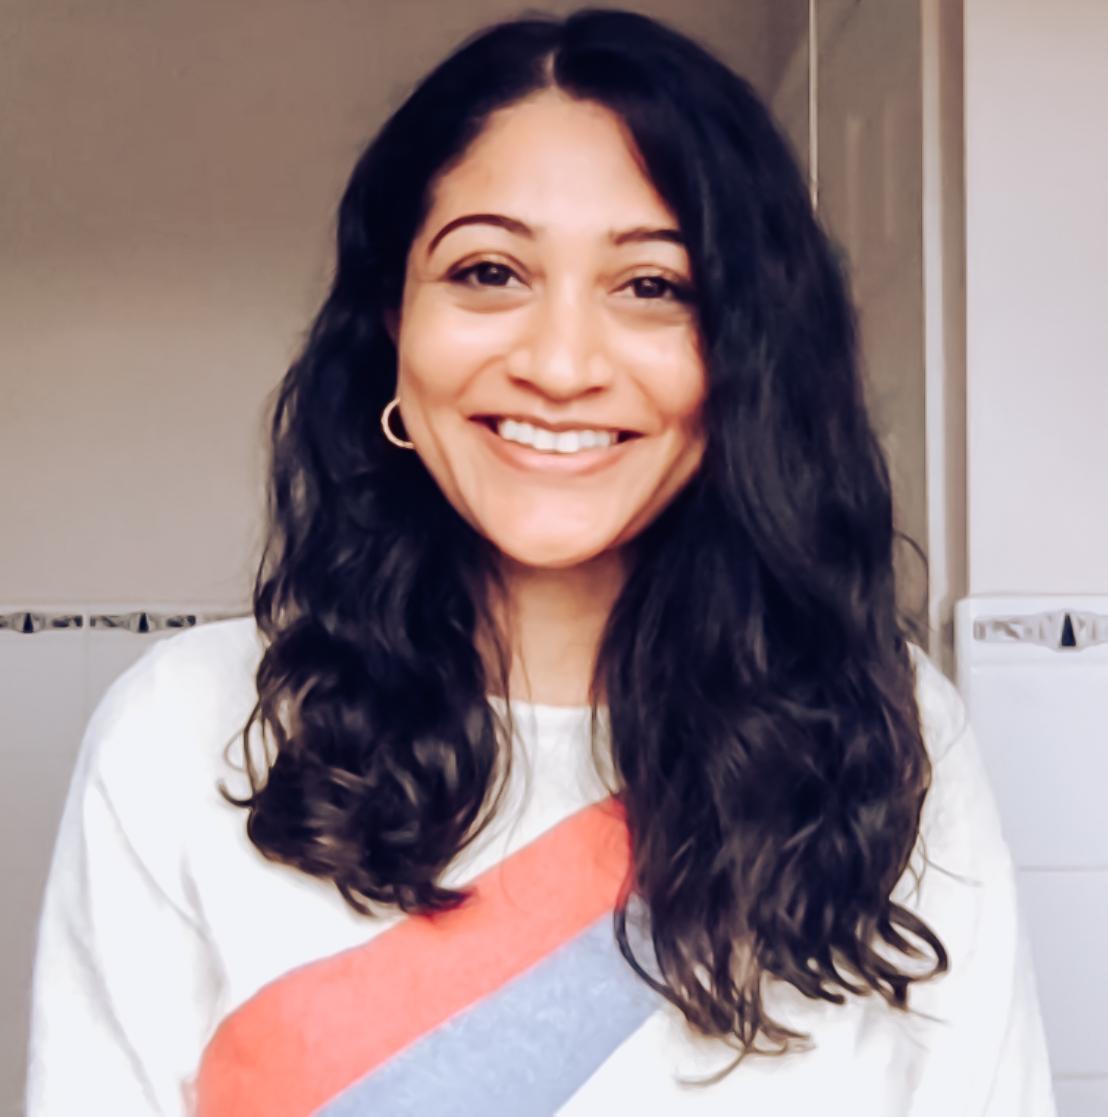 Shrina Patel